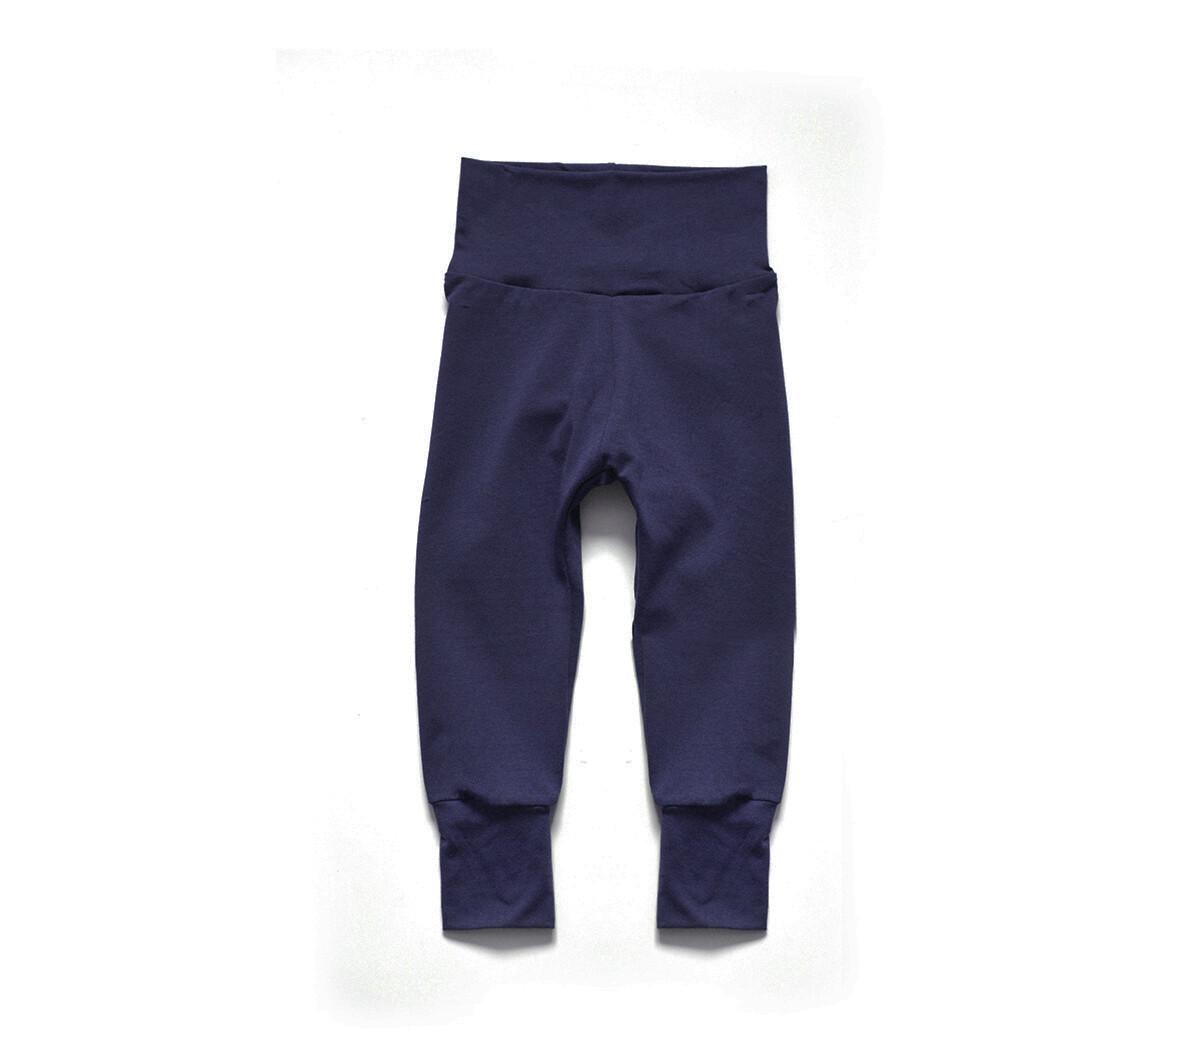 Little Sprout™ Pants Navy - Merino Wool